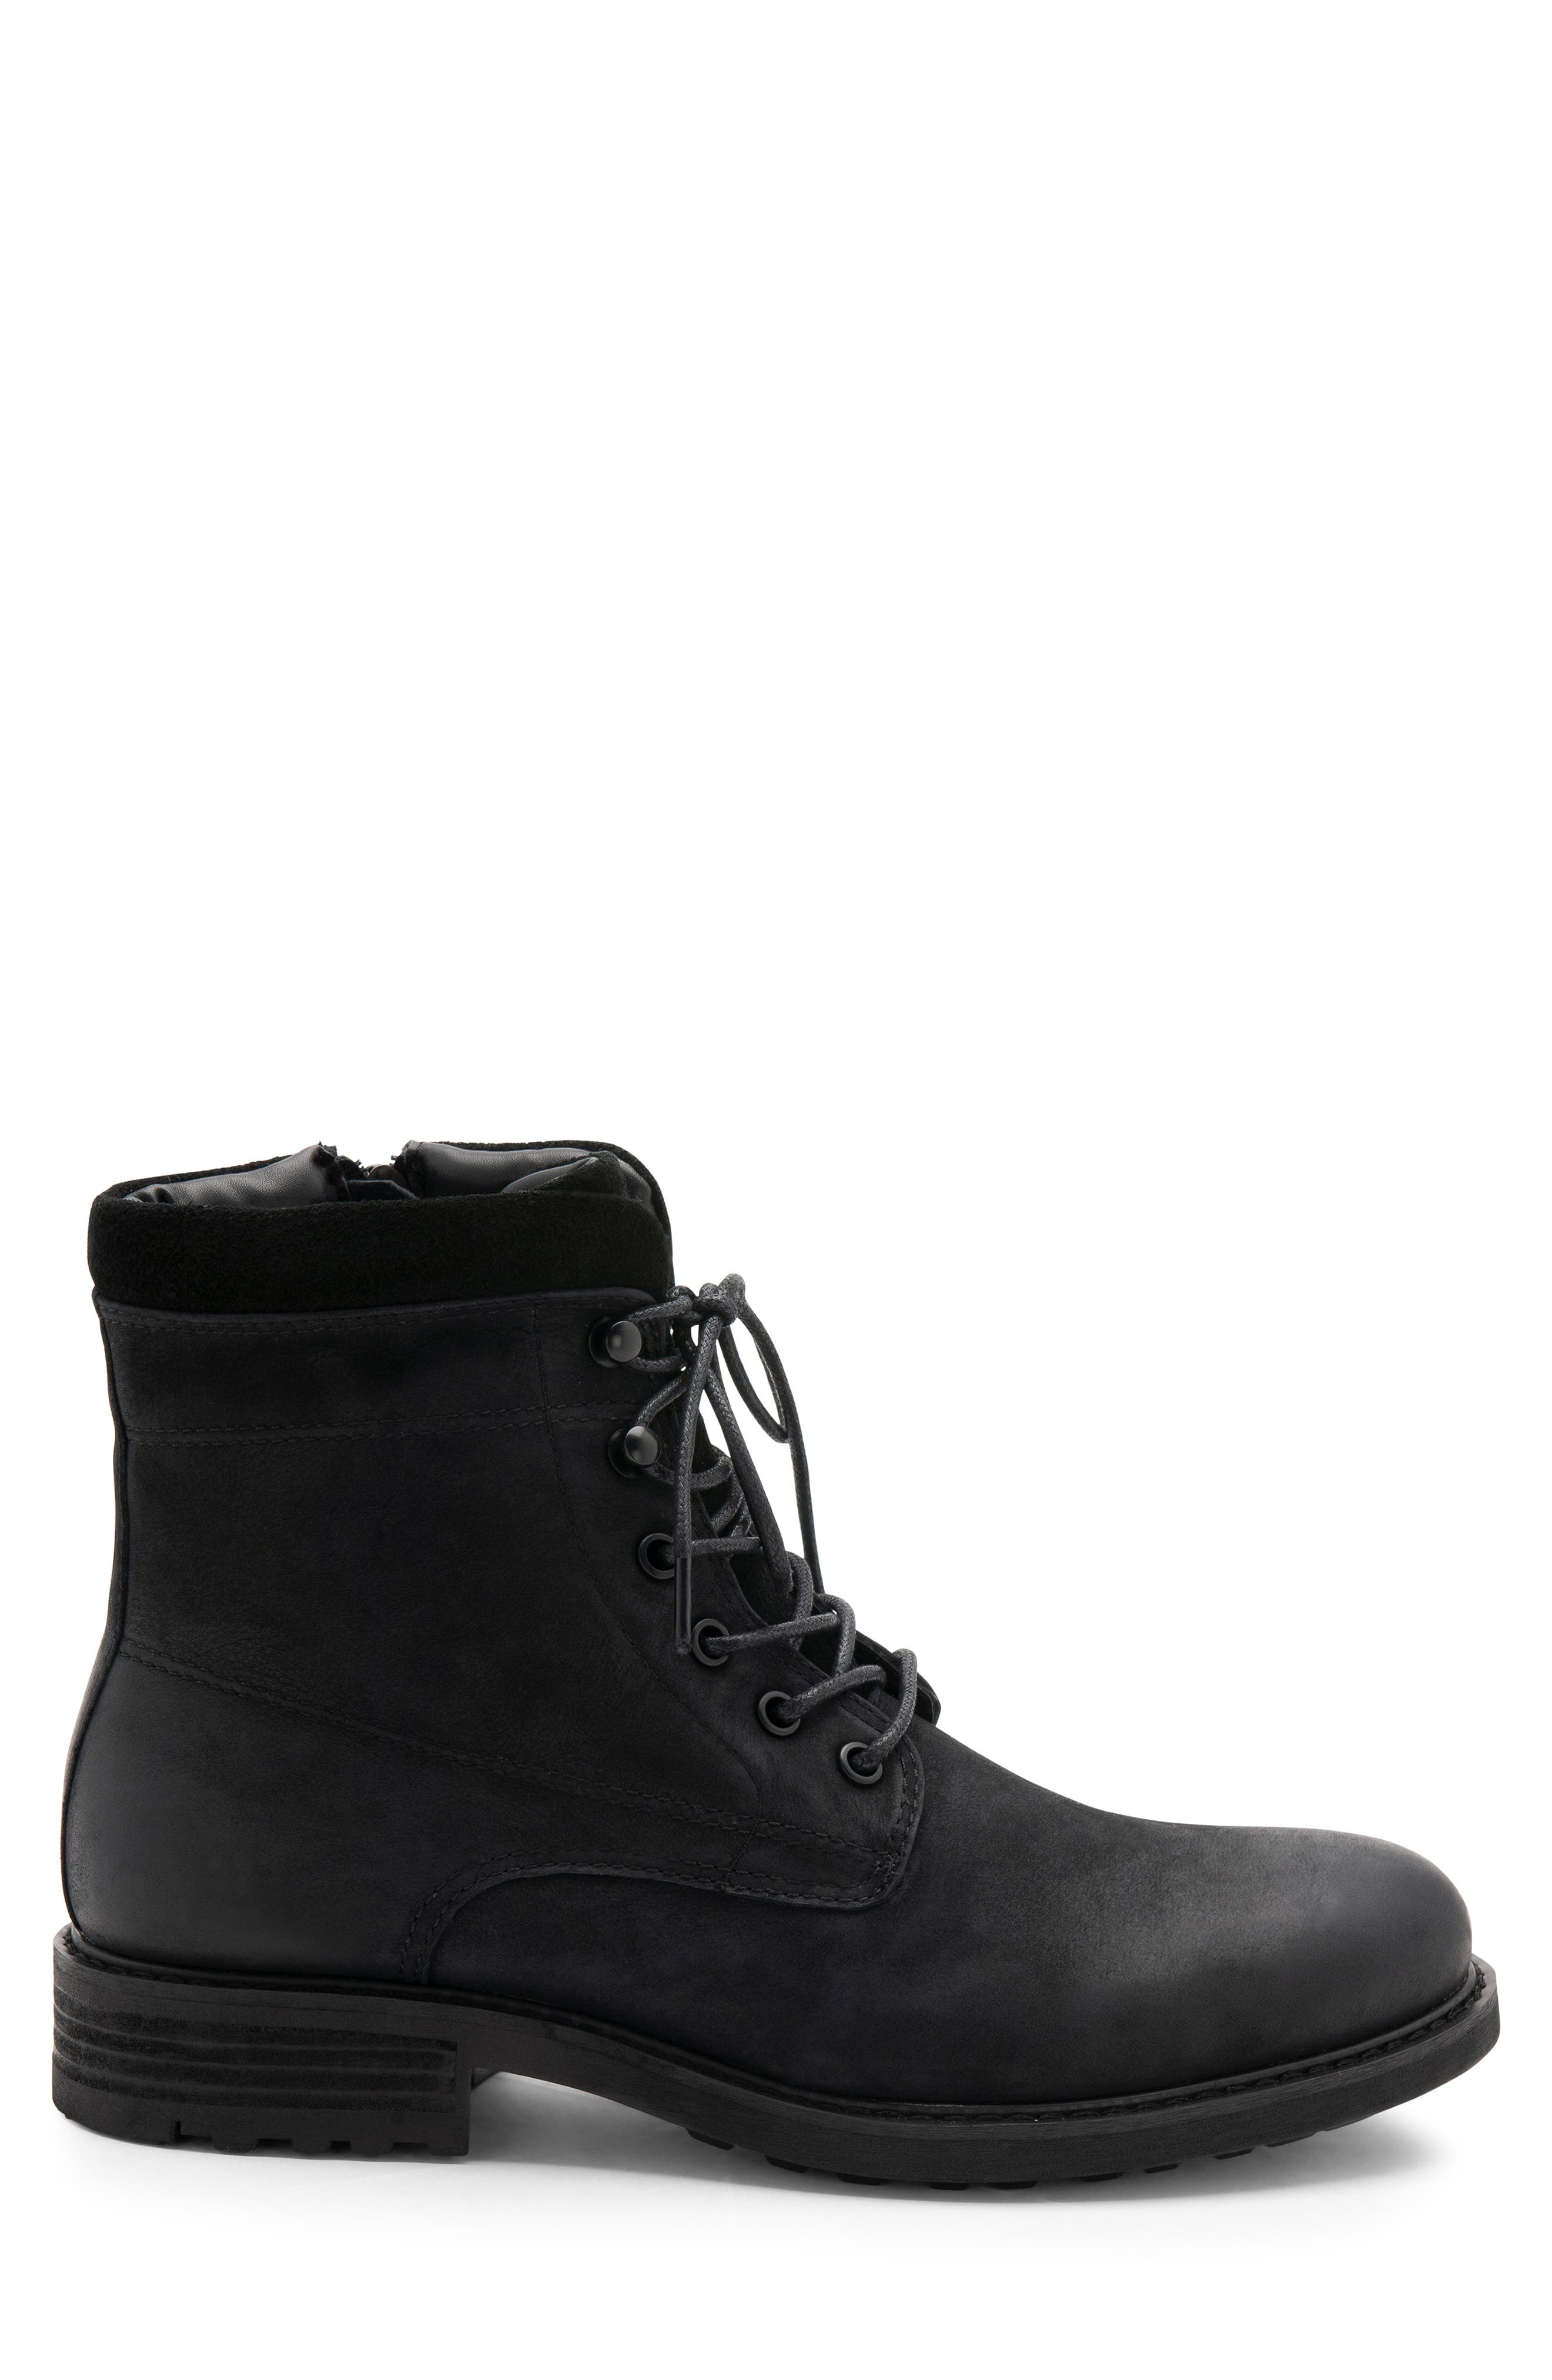 Patton Waterproof Plain Toe Boot,                             Alternate thumbnail 3, color,                             BLACK NUBUCK